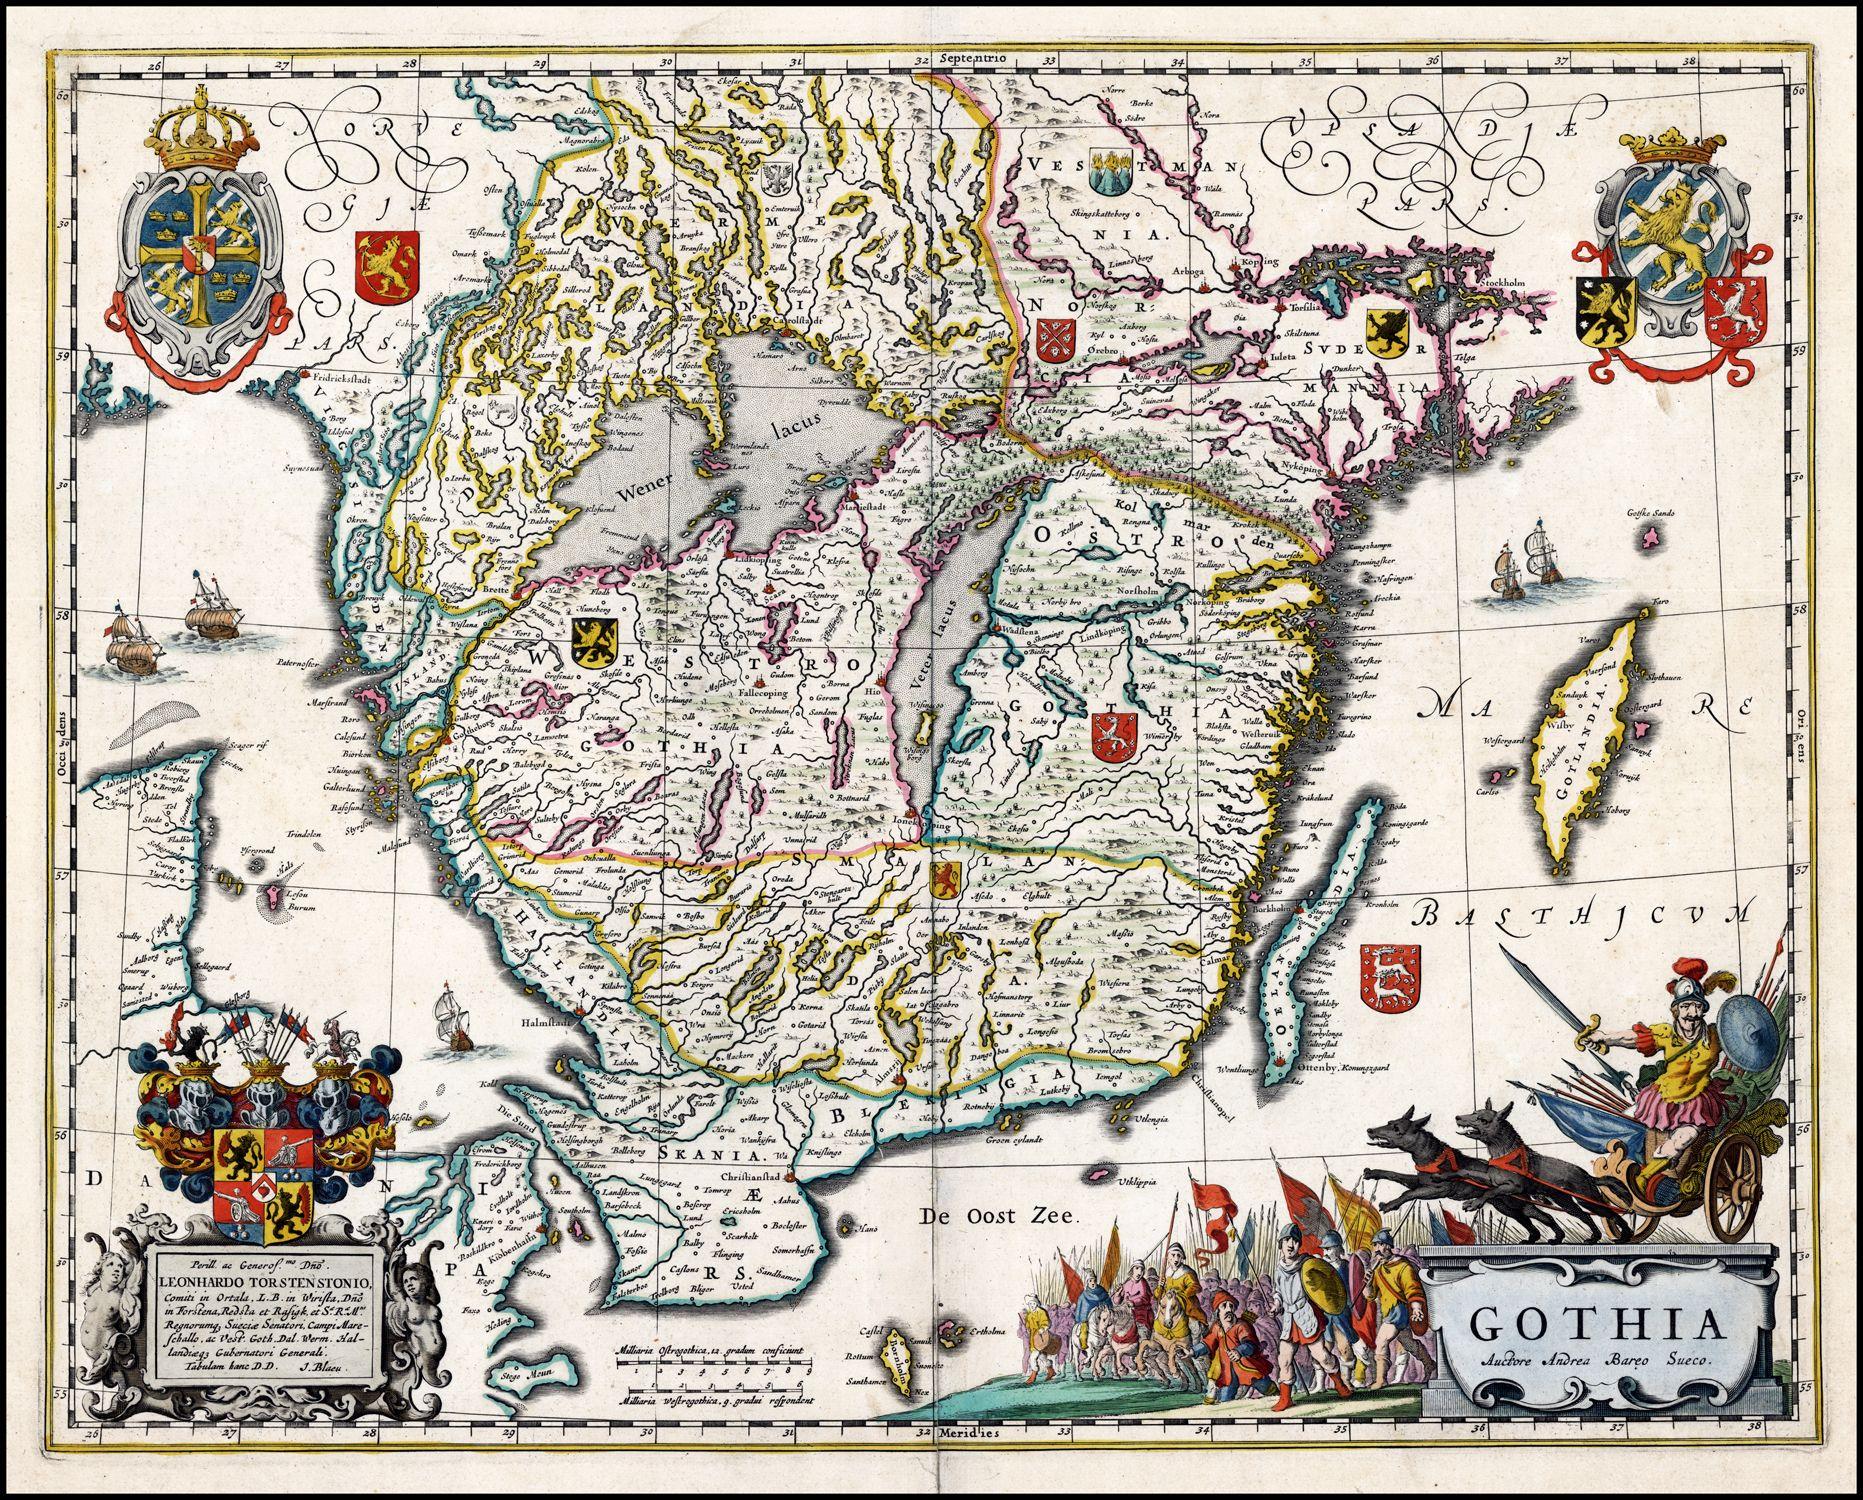 Gothia southern sweden blaeu 1688 cartography pinterest explore antique maps vintage maps and more publicscrutiny Image collections